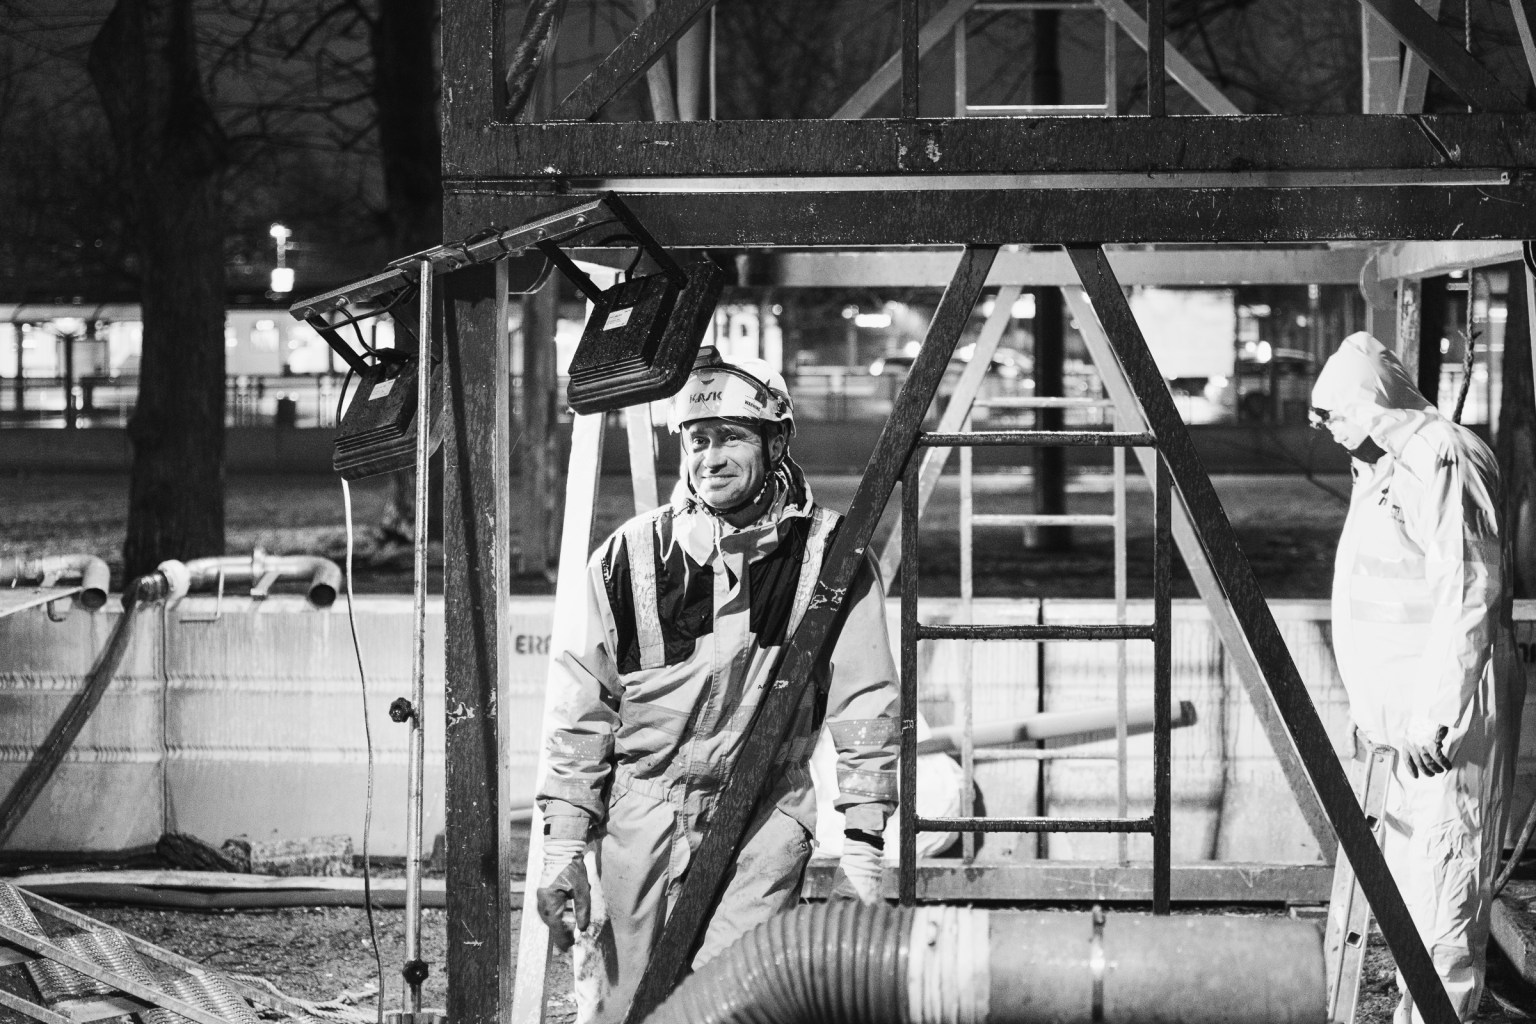 Arbetare, Aarsleff, dokumentationsbild, svartvit bild, Norrköping